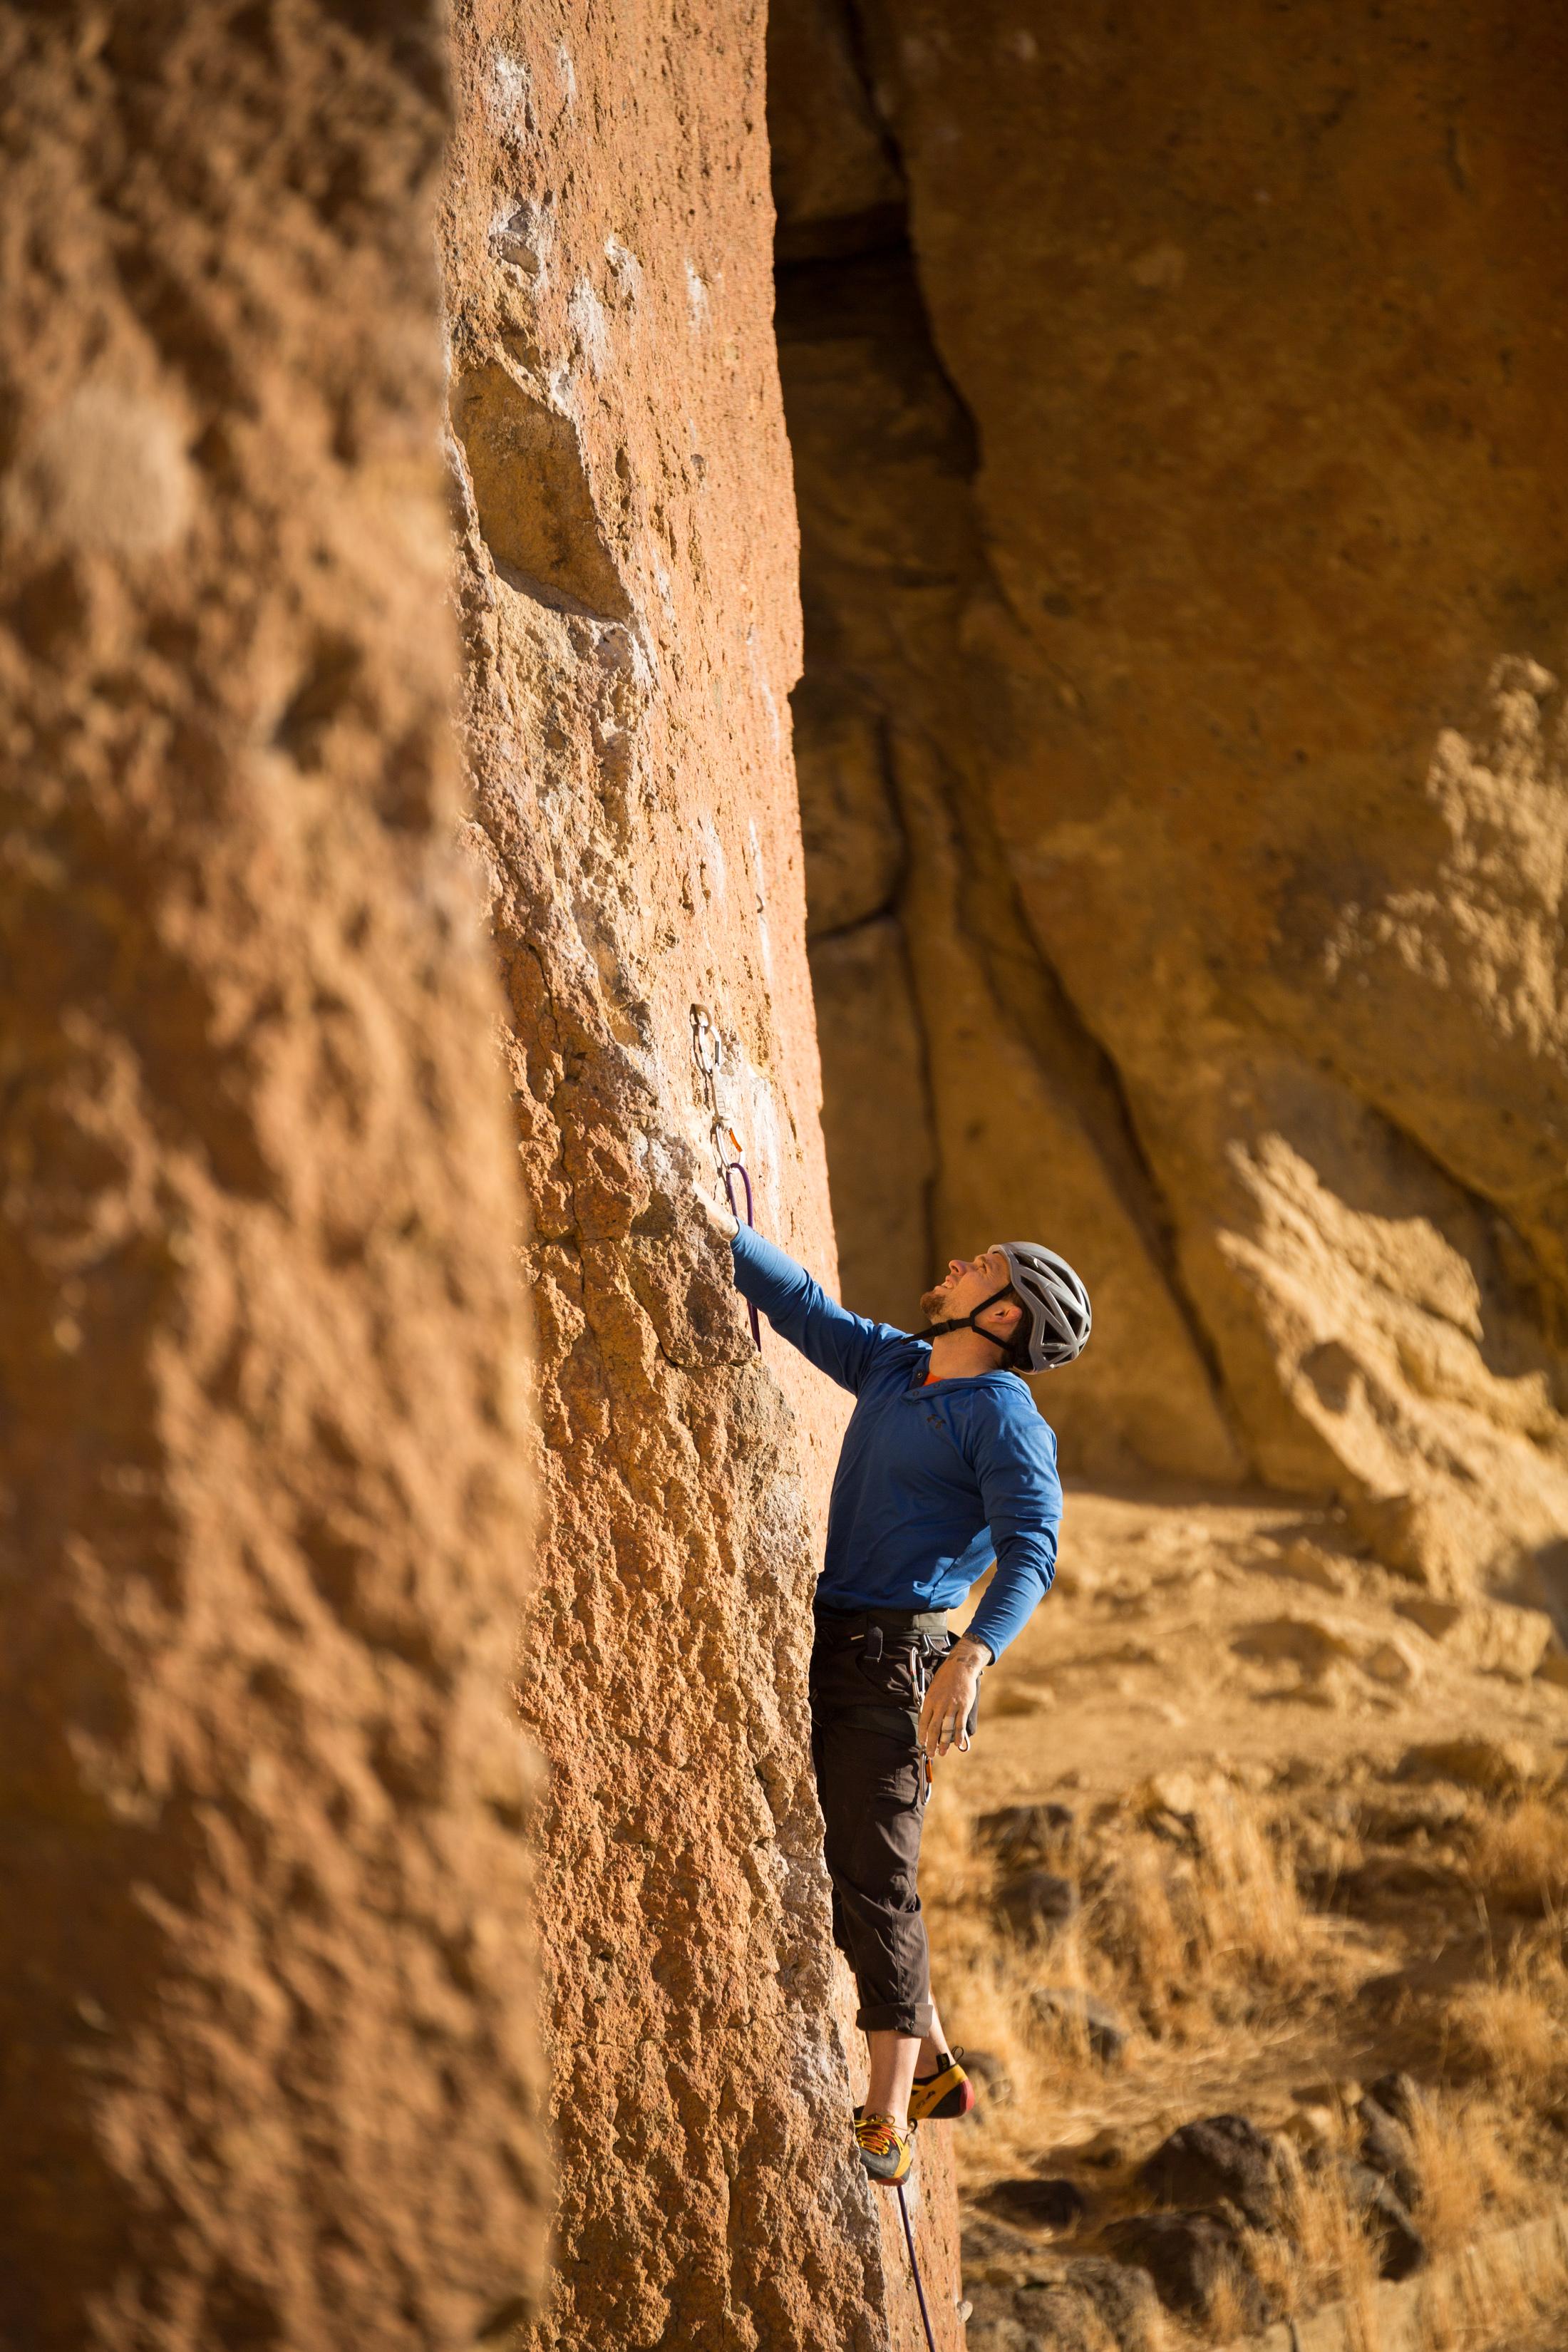 Cameron Apple, Smith Rock. Photo by Nicole Wasko, @nicole_wasko